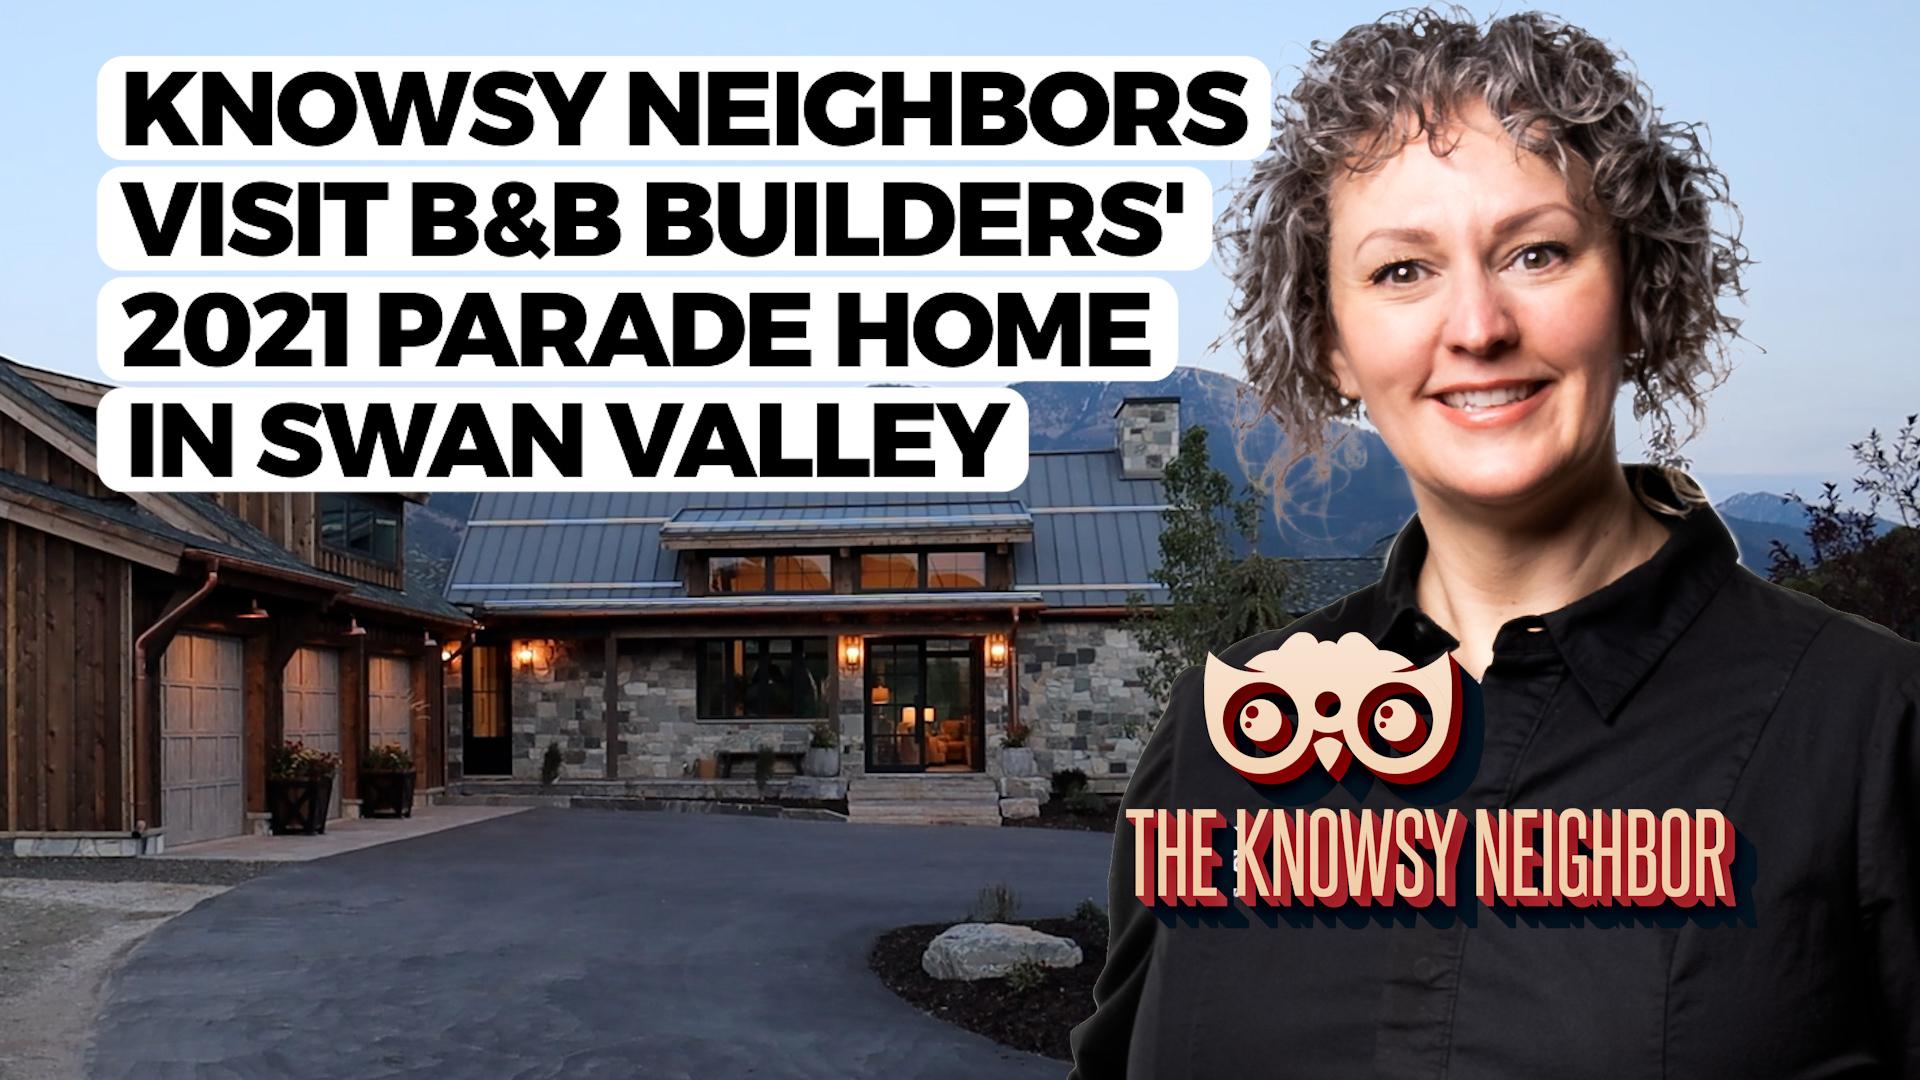 The Knowsy Neighbors visit B&B Builders in Swan Valley!